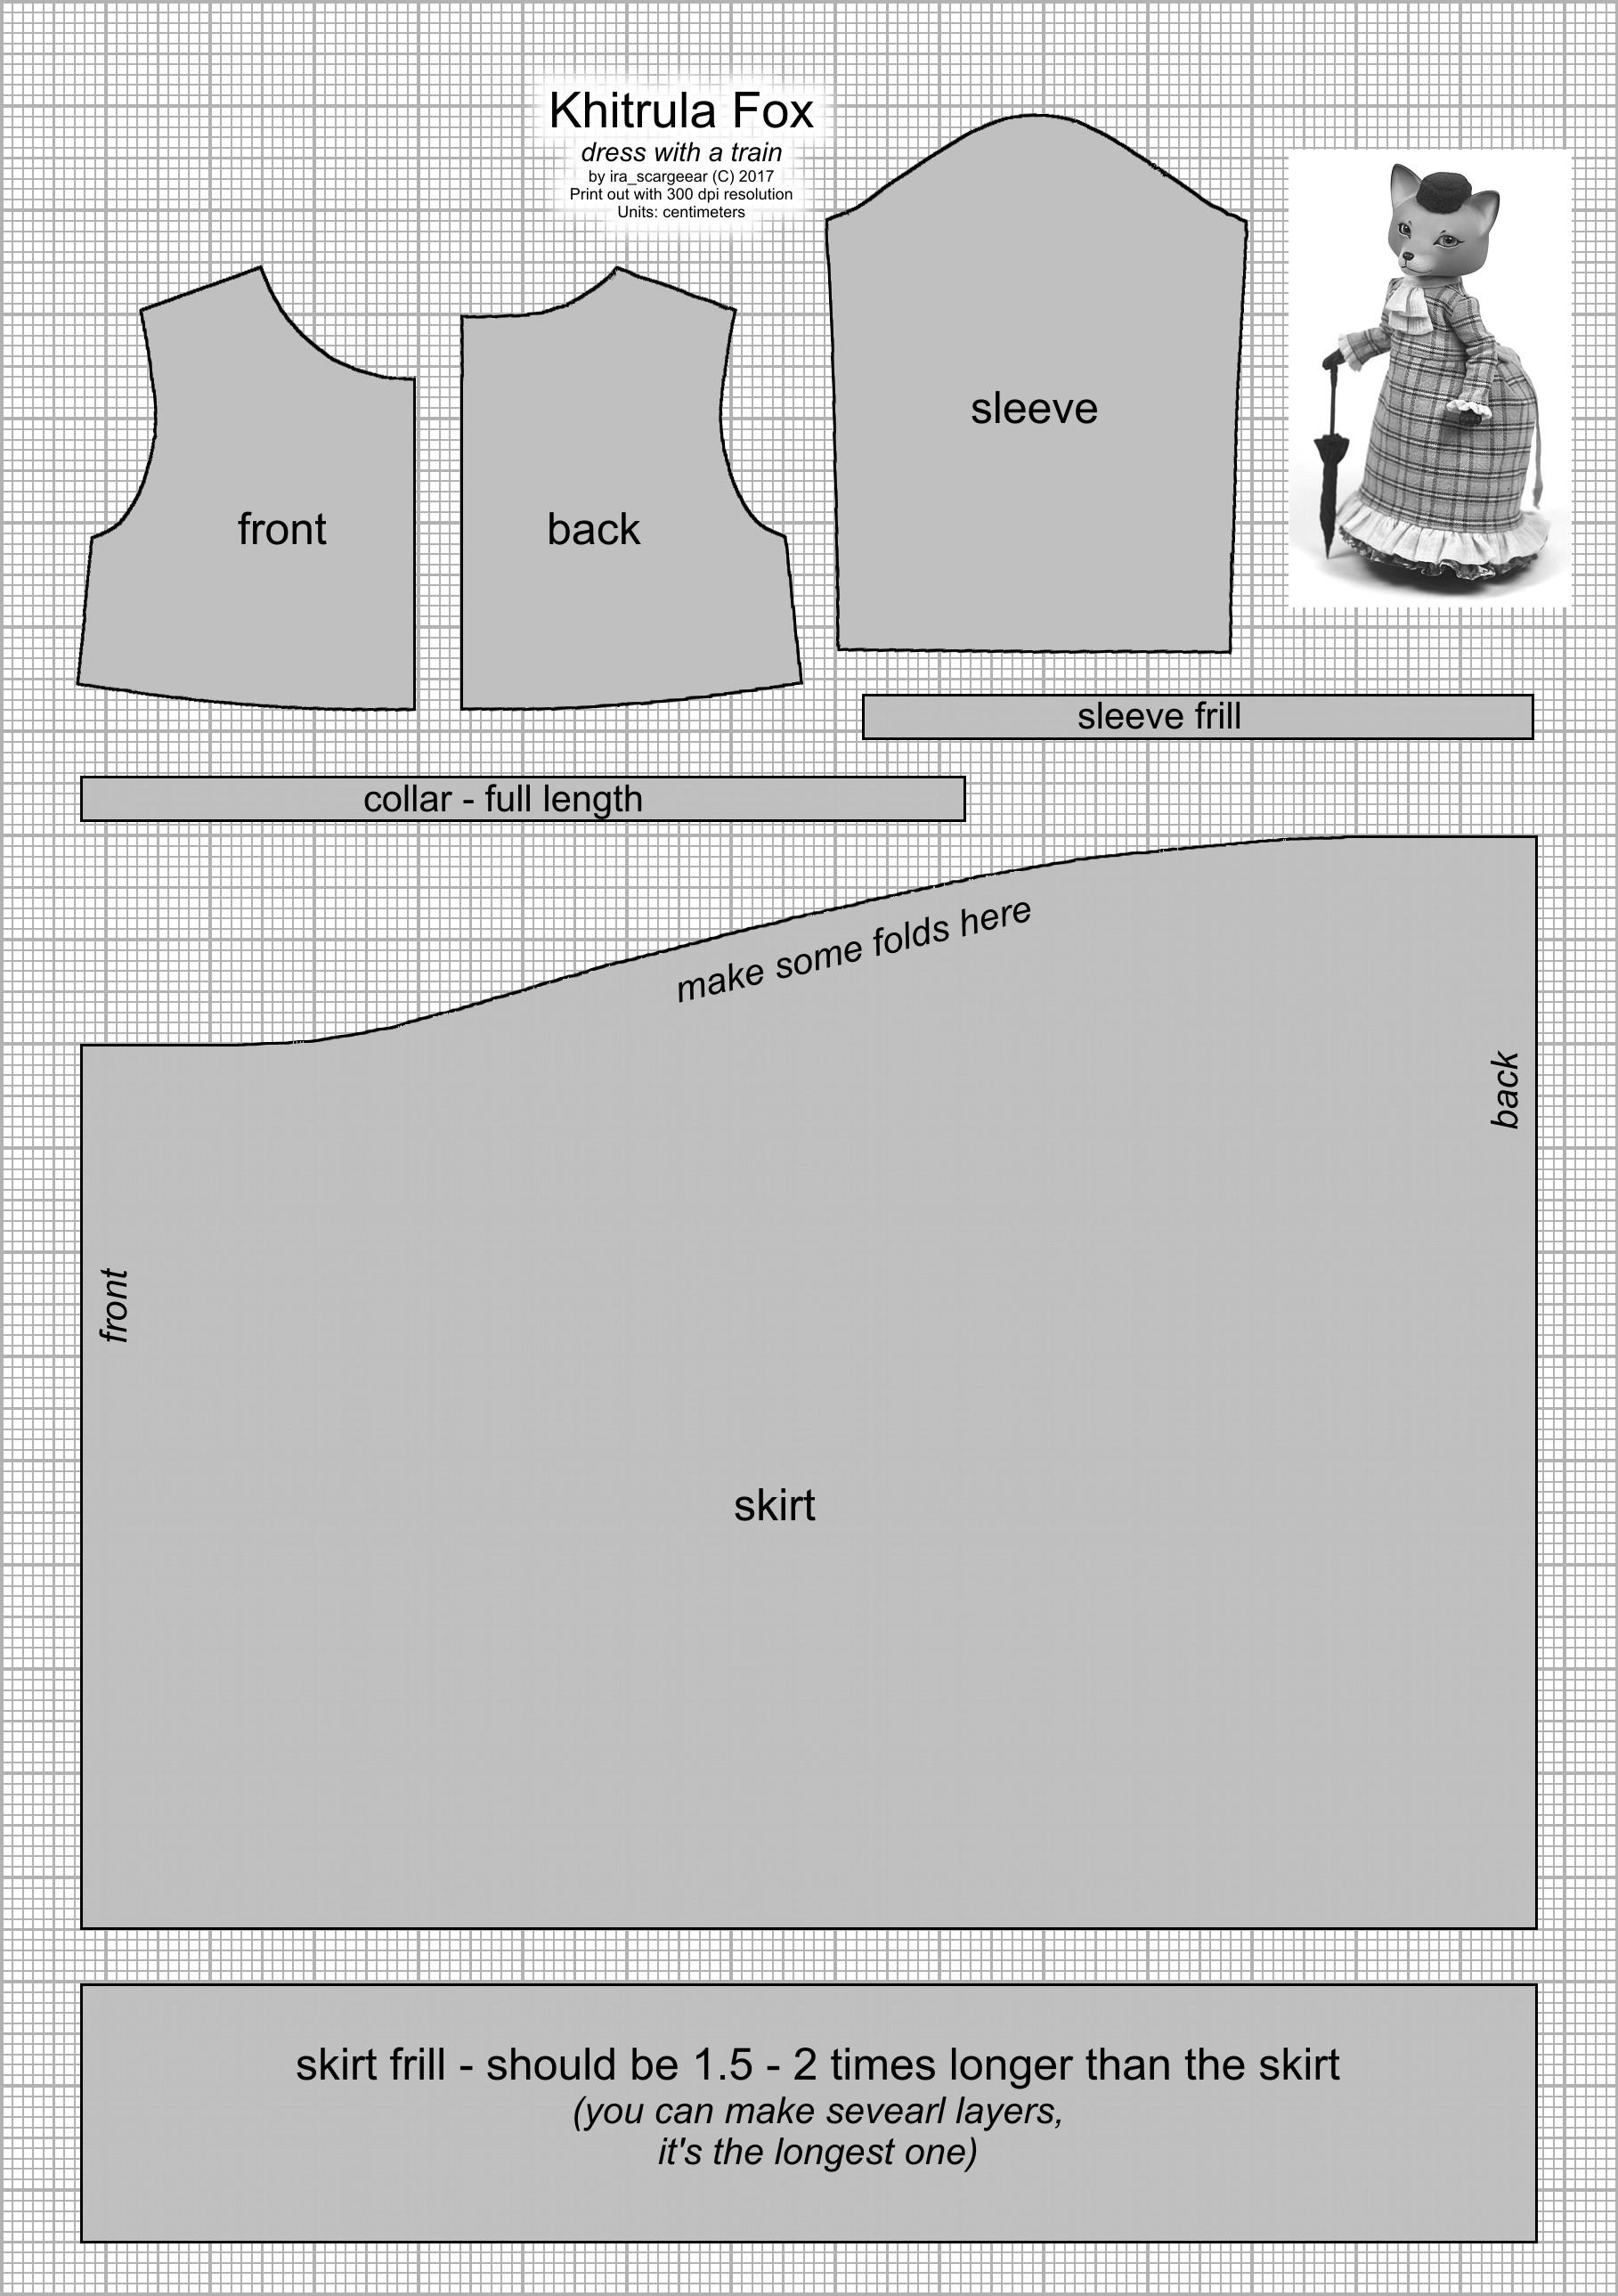 Khitrula Fox Dress Pattern